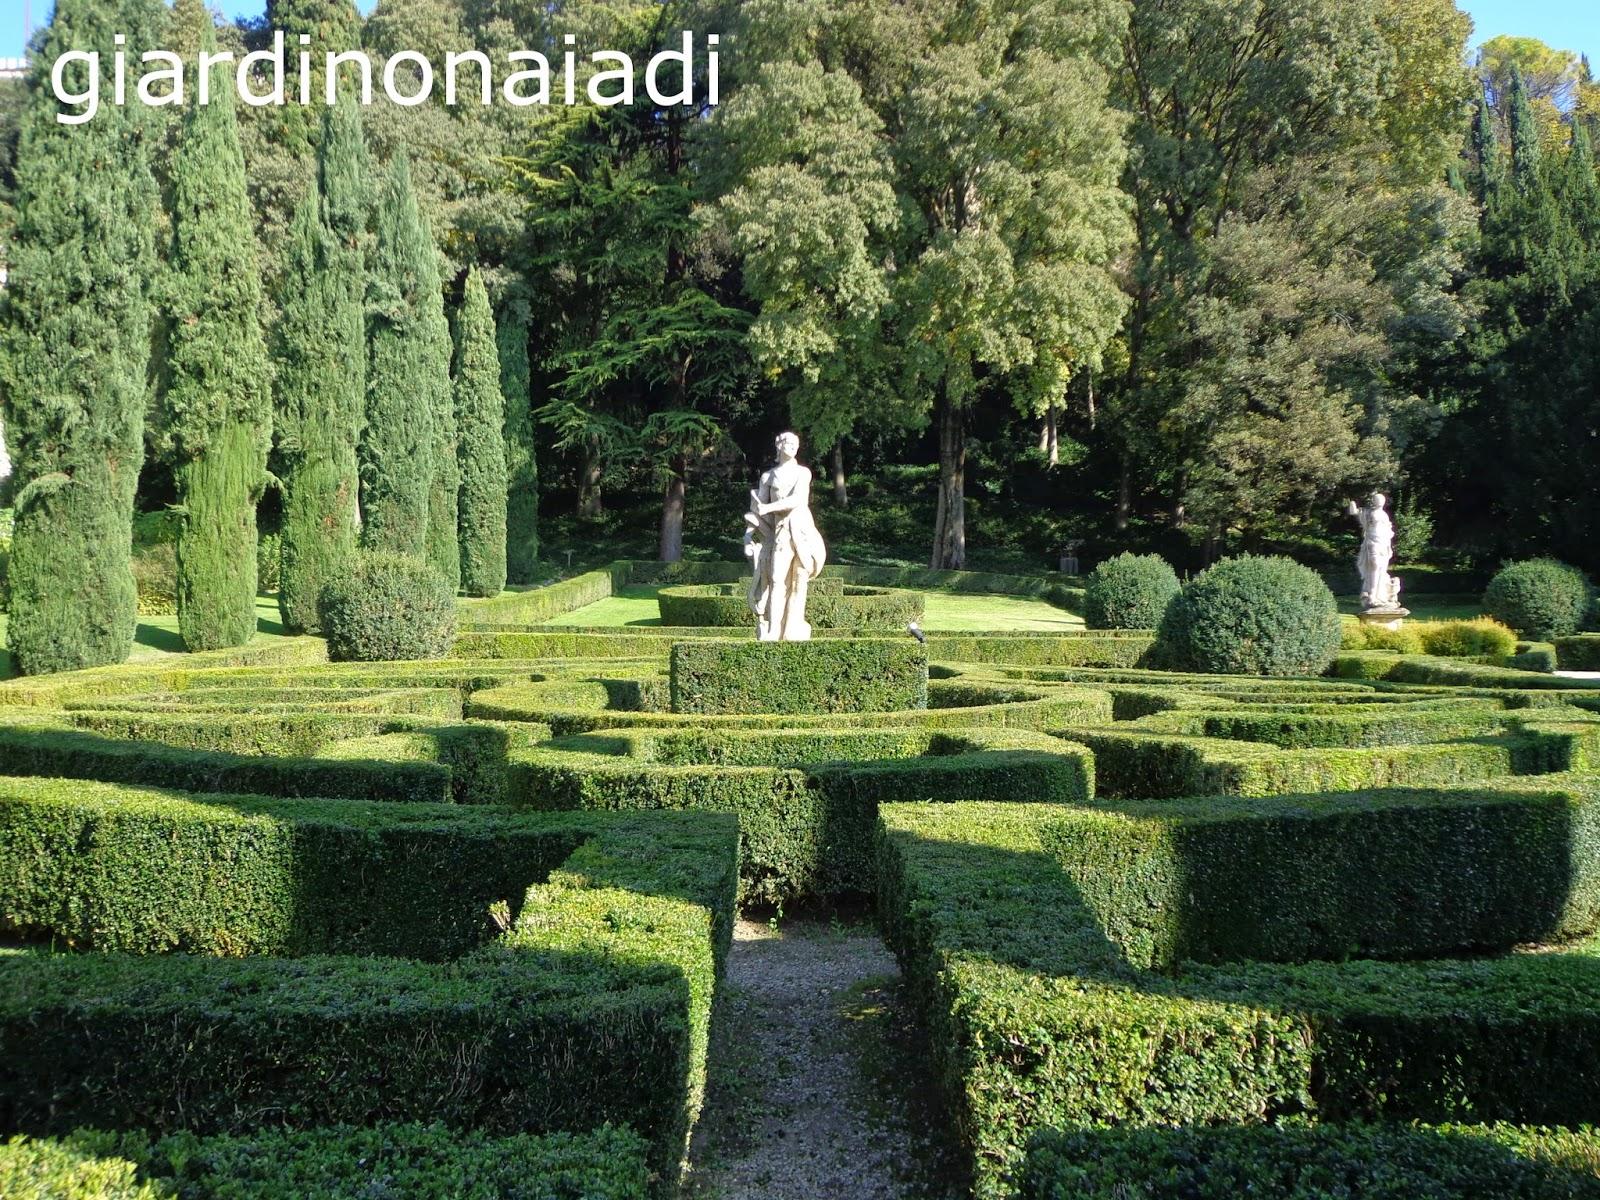 Il giardino delle naiadi giardino giusti verde ed arte - Arte e giardino ...